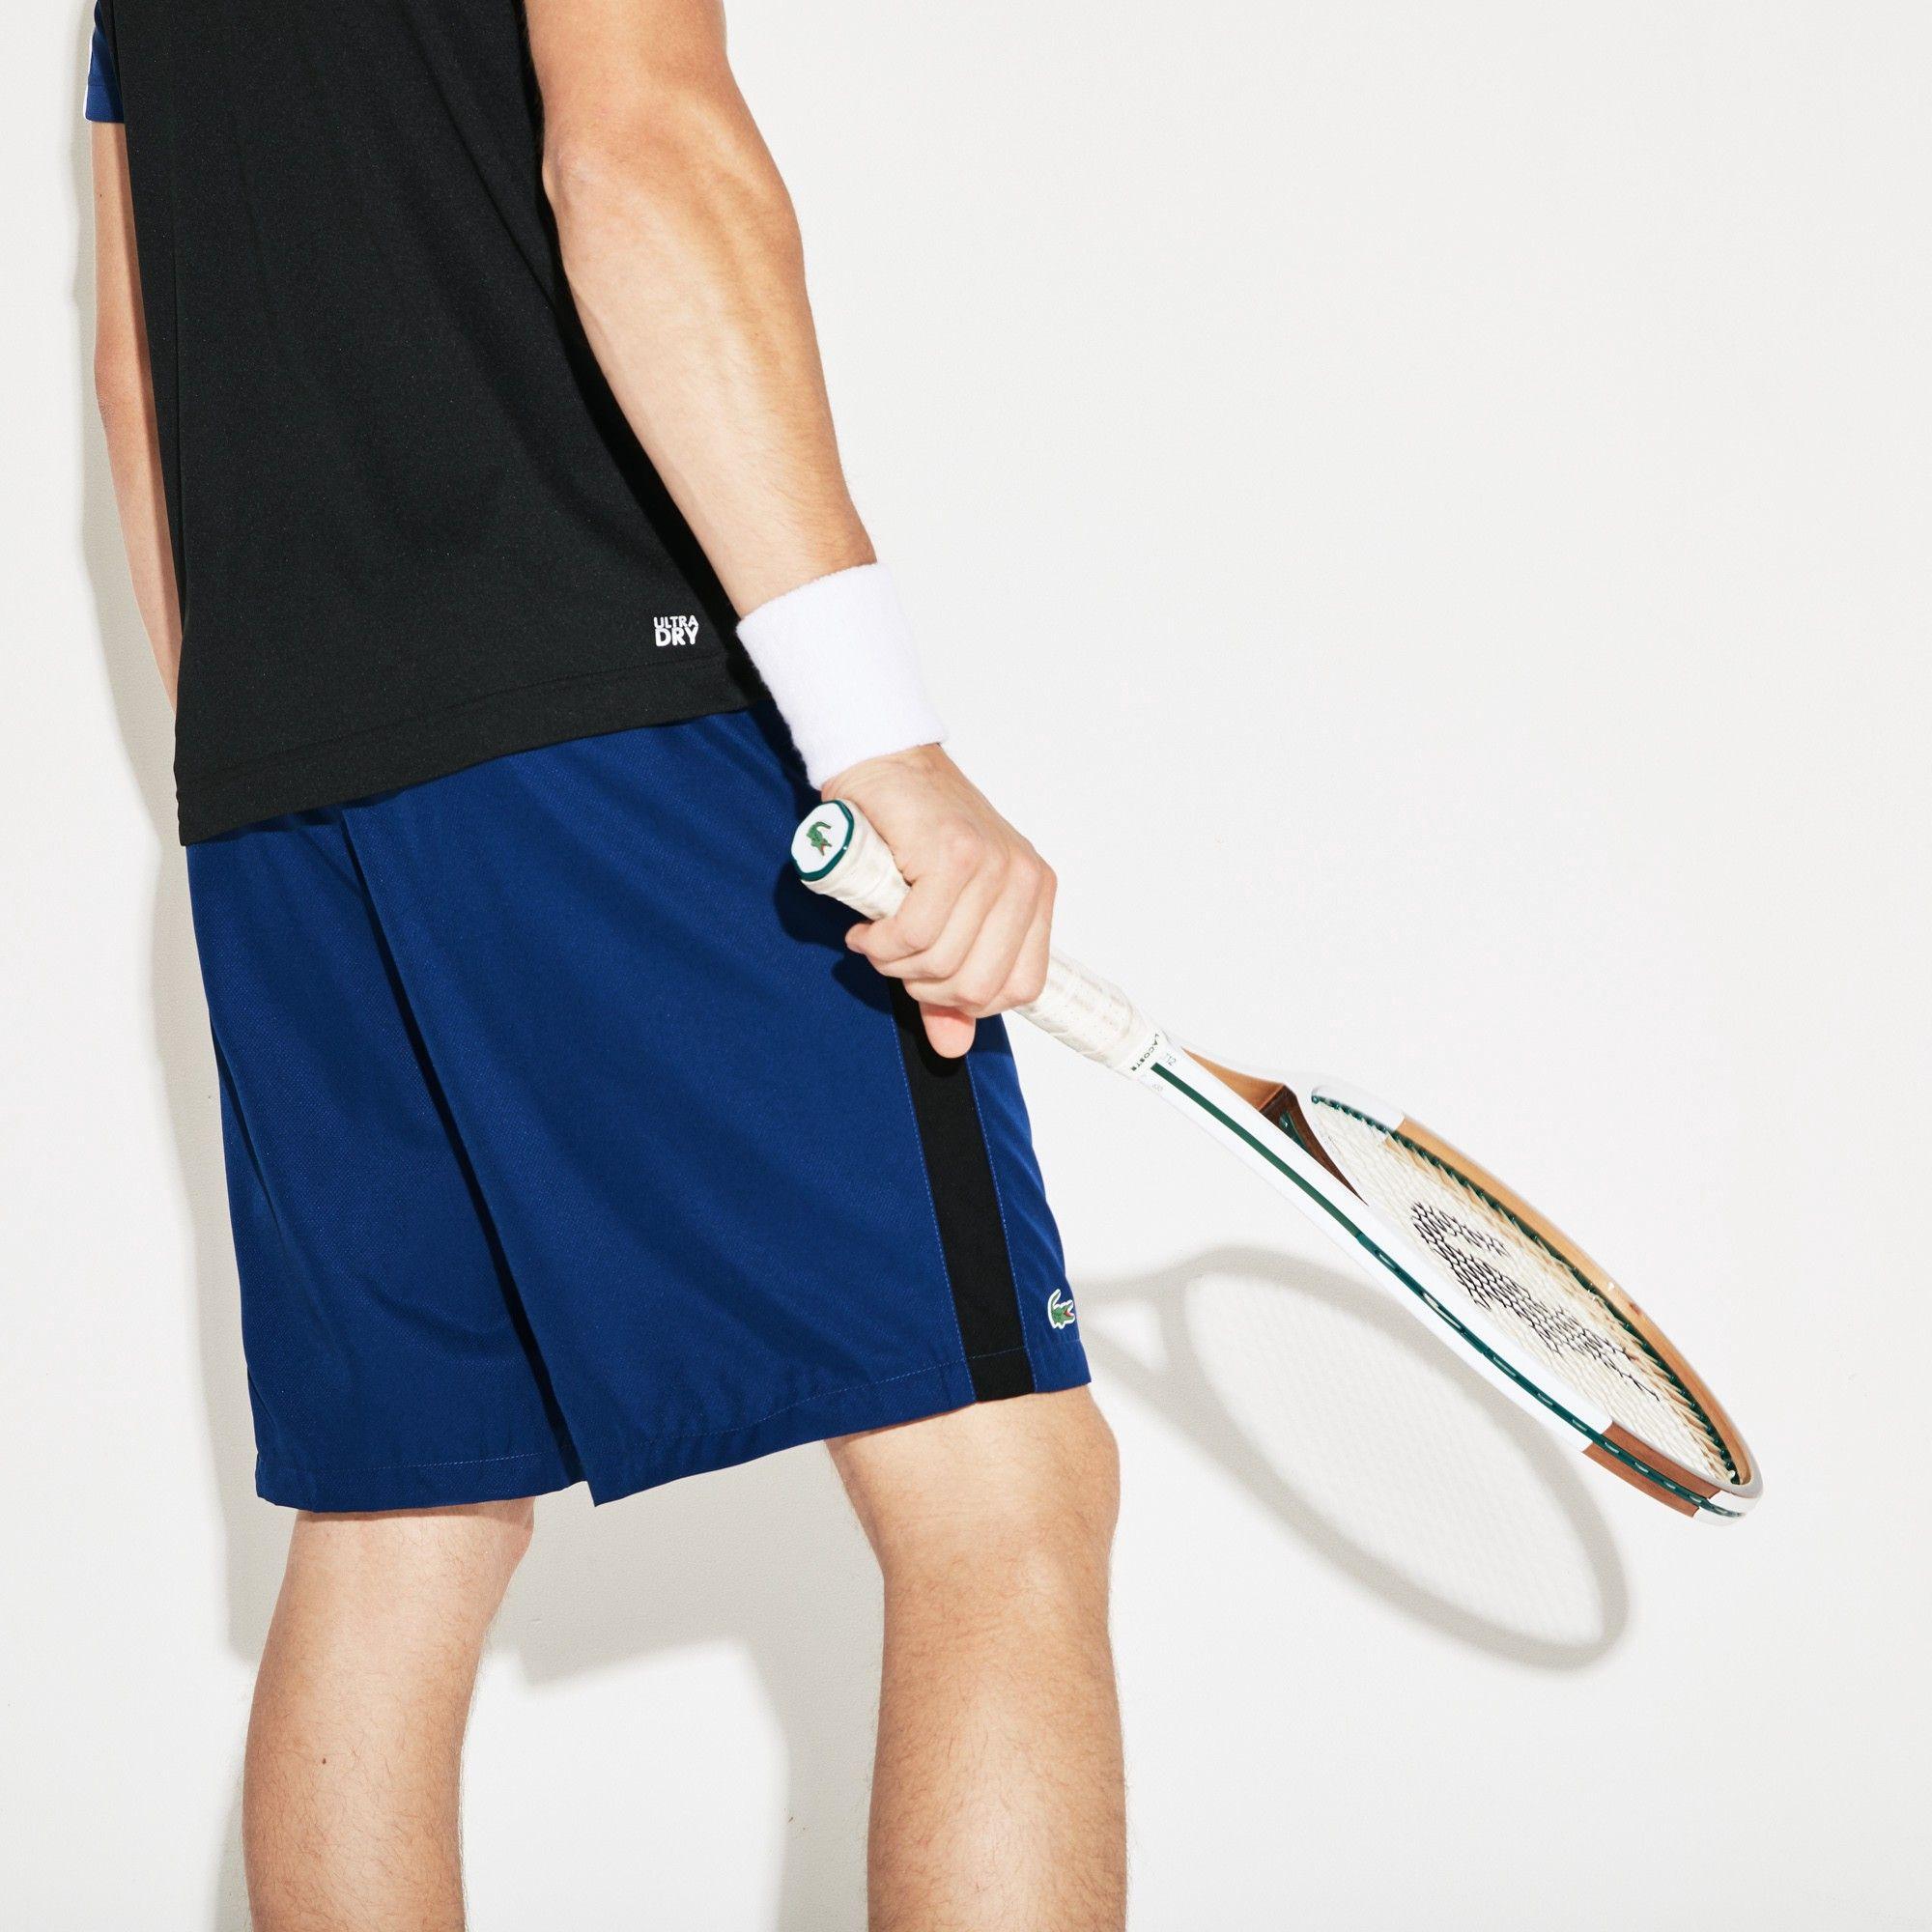 8381420cf8b3 Lacoste Men s Sport Colored Bands Taffeta Tennis Shorts - Navy  Blue Papeete-Menthol Xxl 7 Green